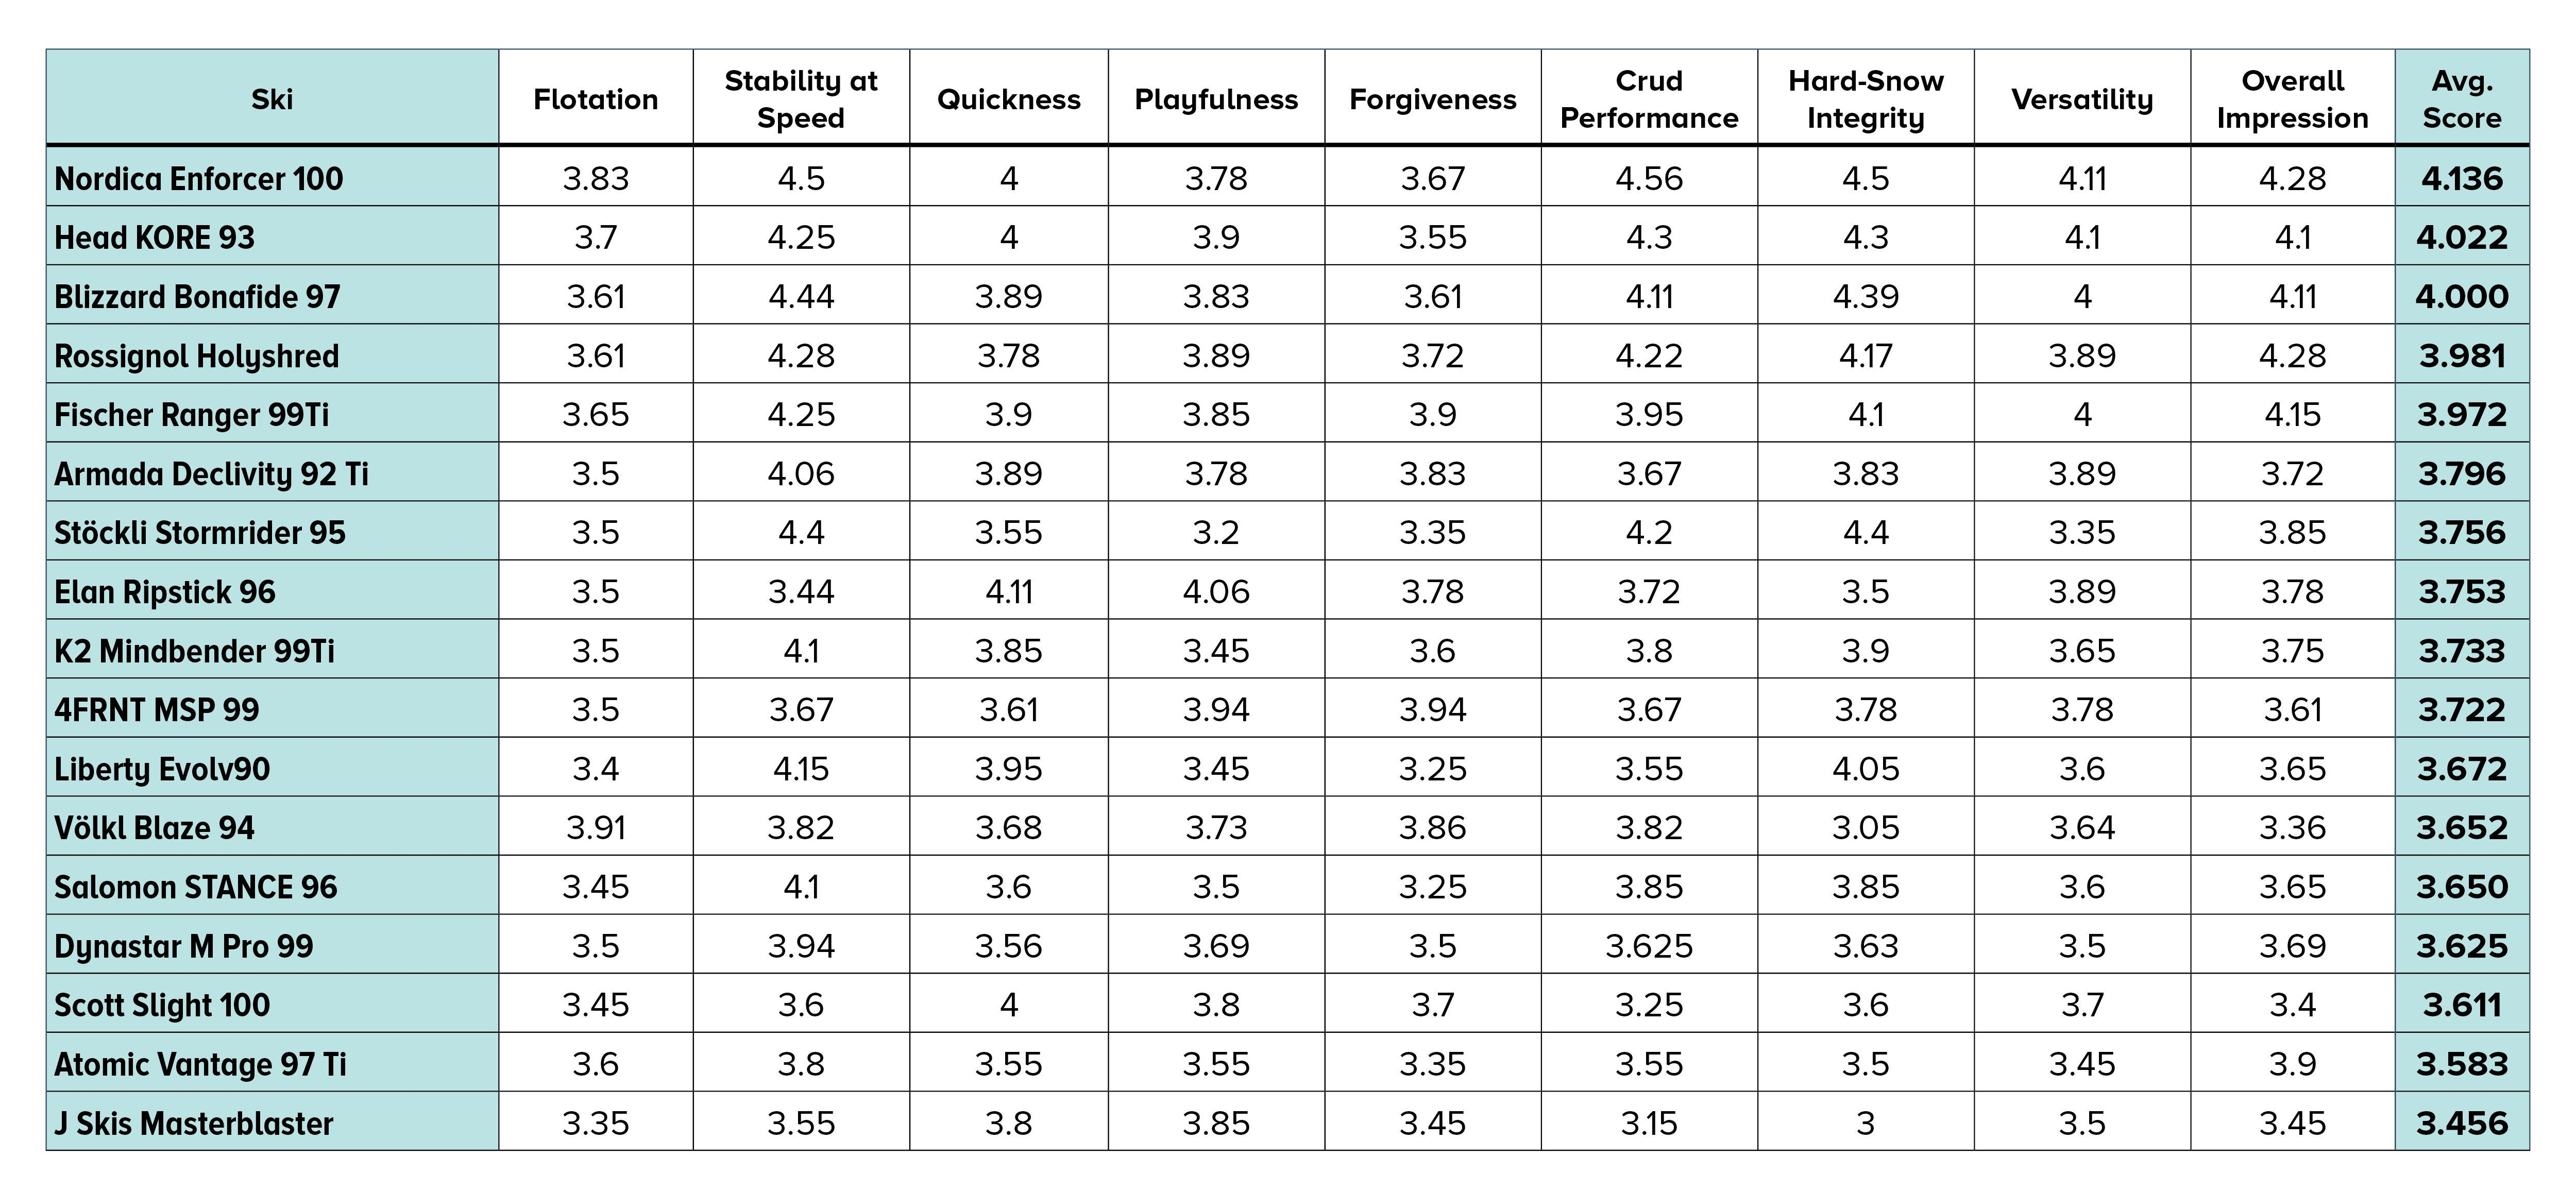 2021 SKI Test Scores for Men All-Mountain category